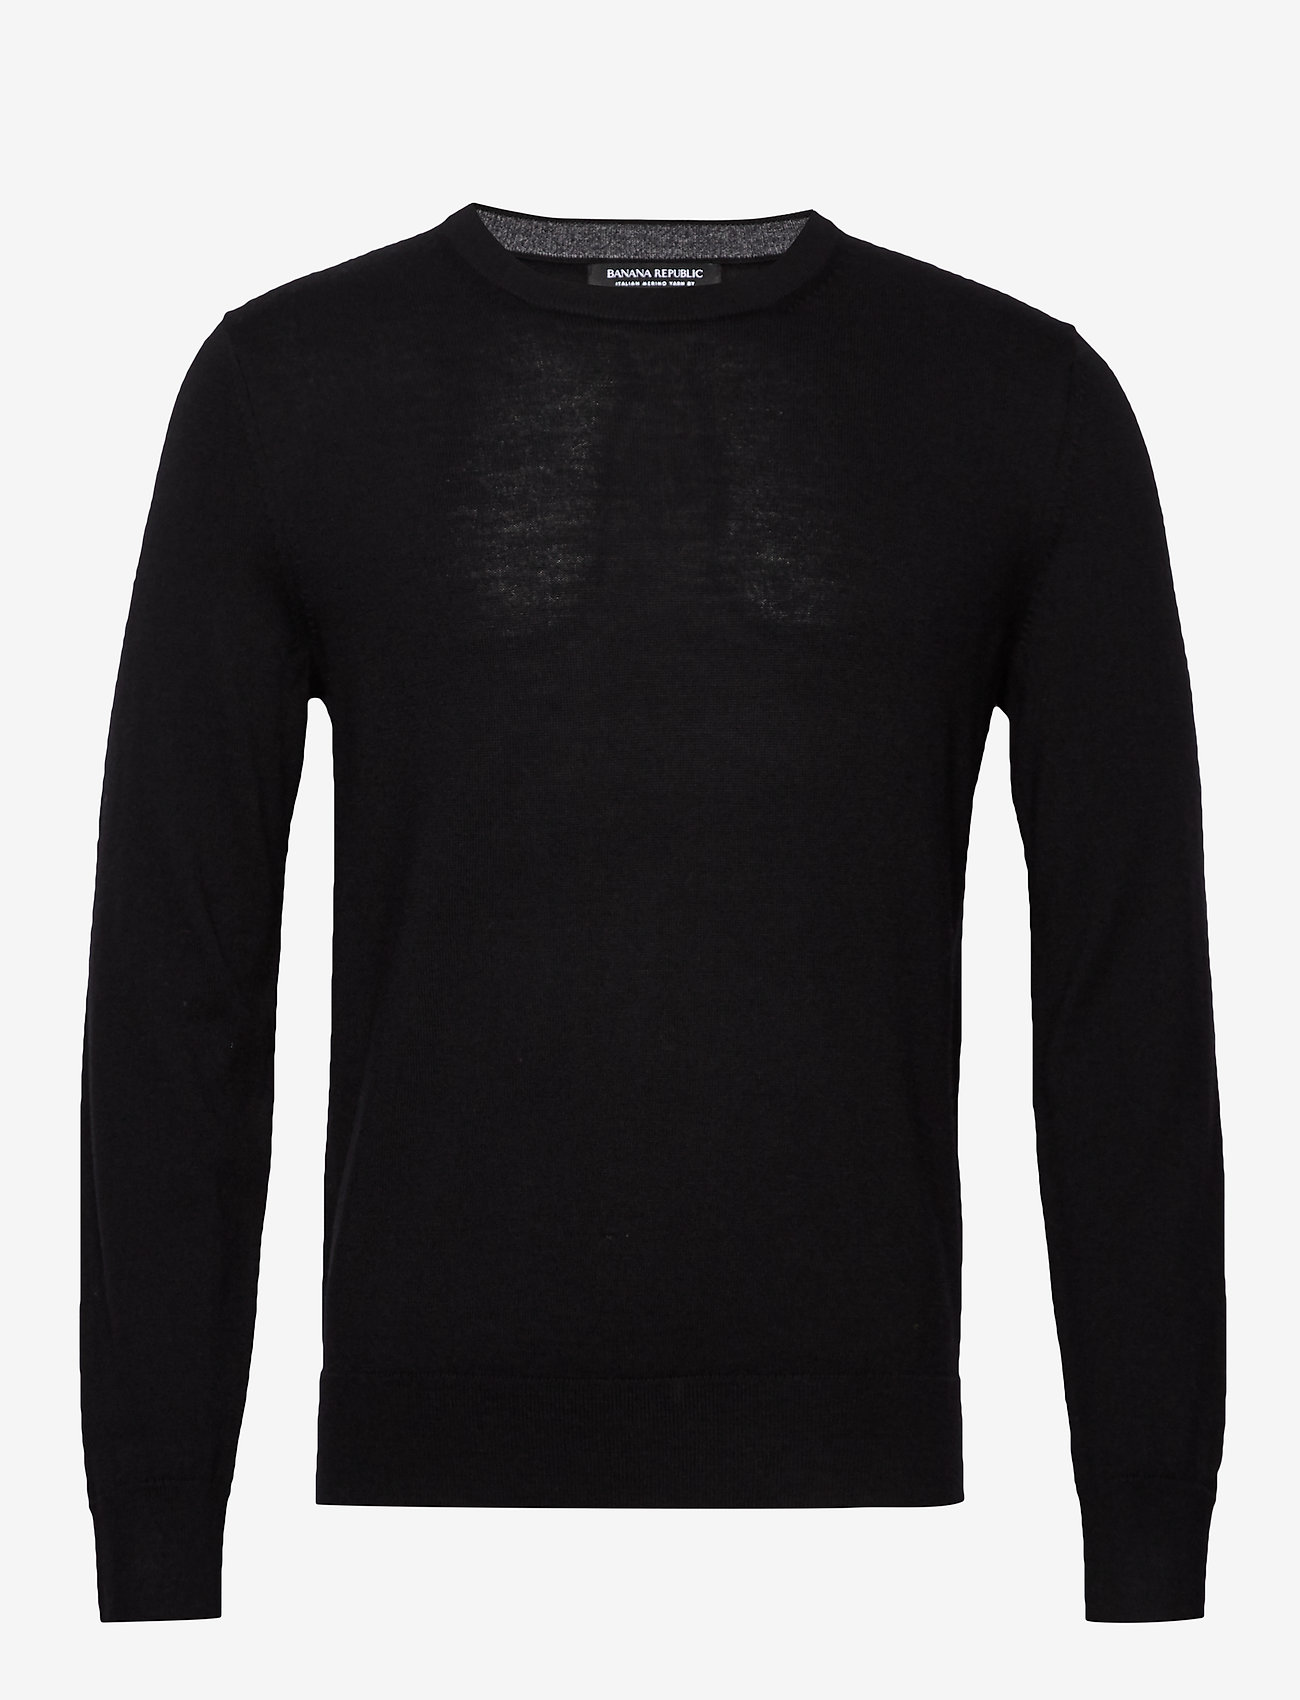 Banana Republic - Italian Merino Crew-Neck Sweater - basic knitwear - black - 0